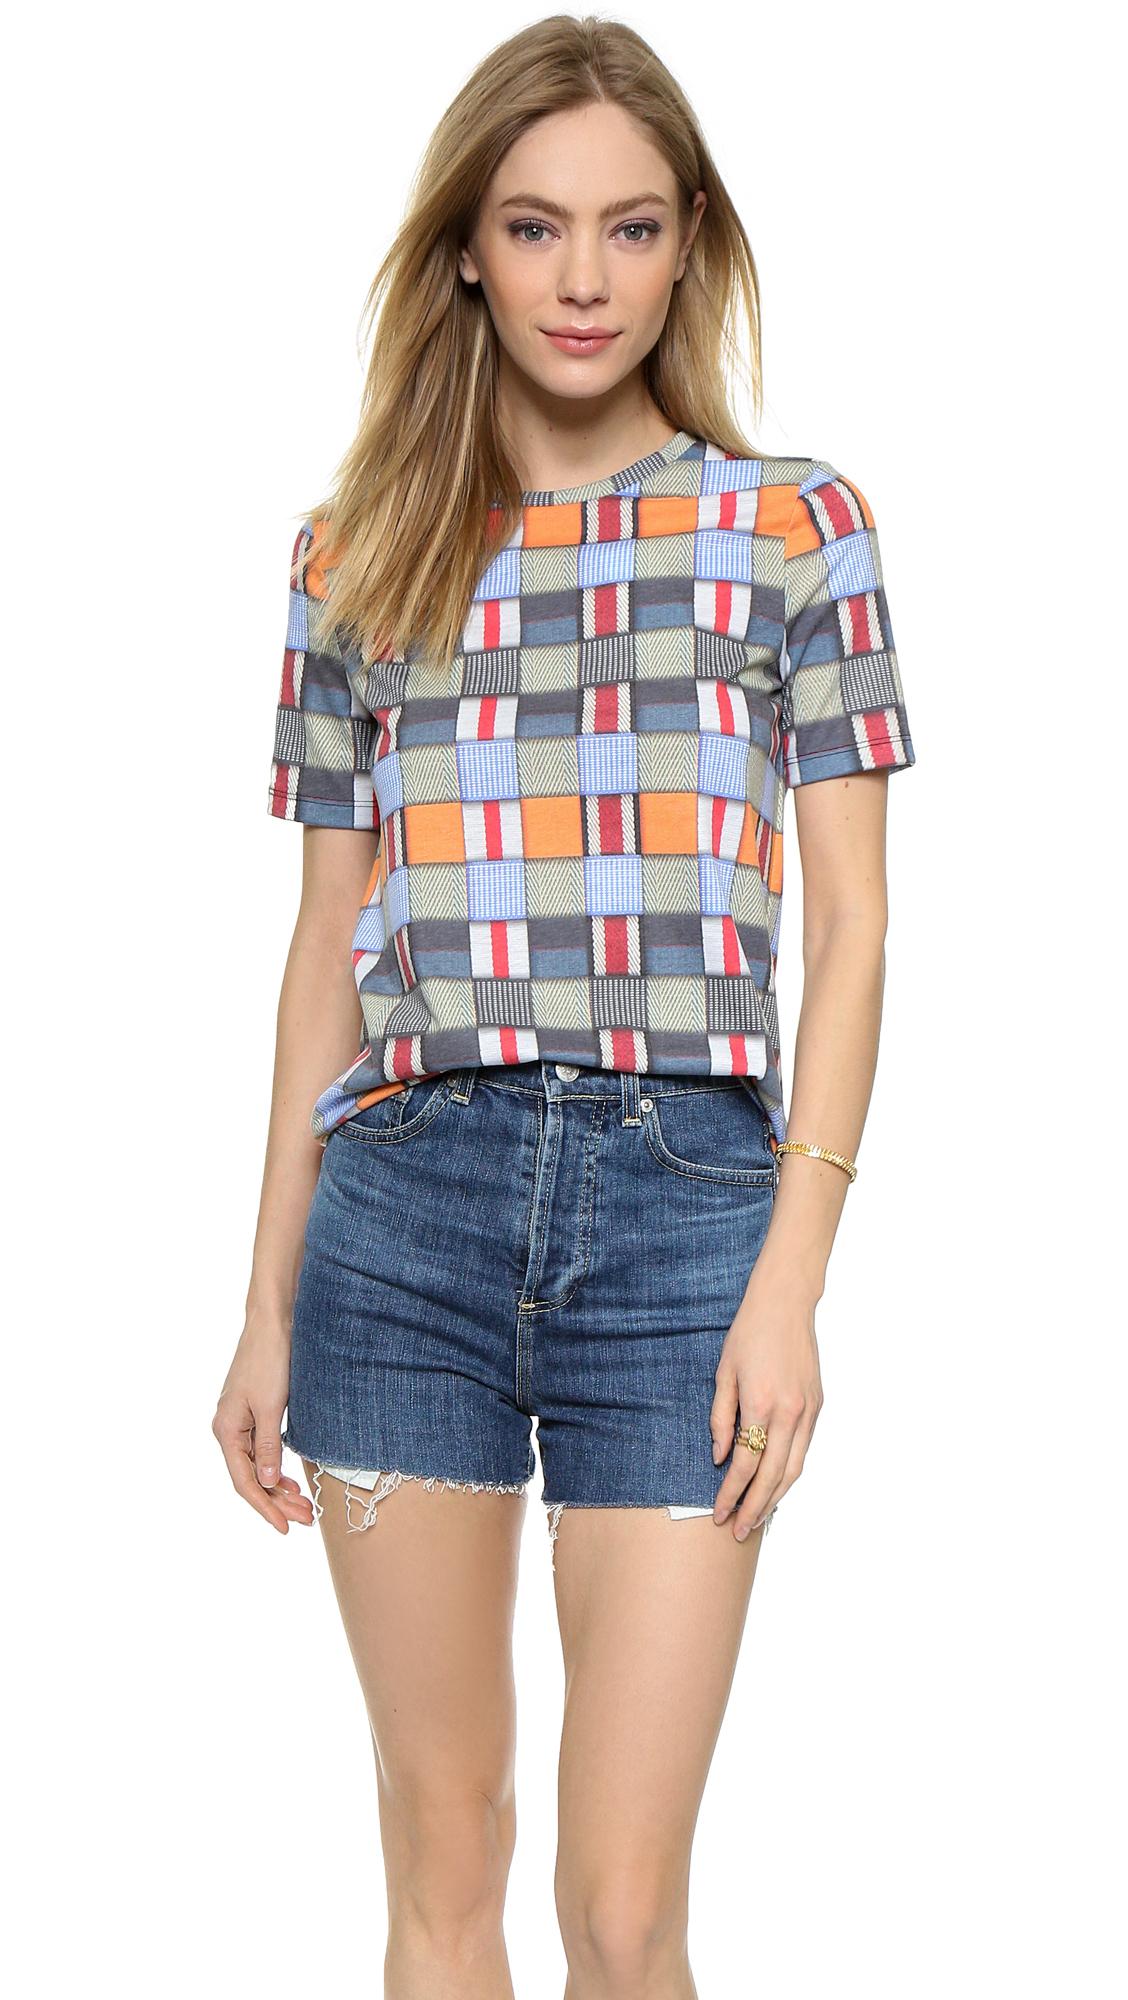 Lyst tory burch patchwork tee shirt multi web for Tory burch t shirt